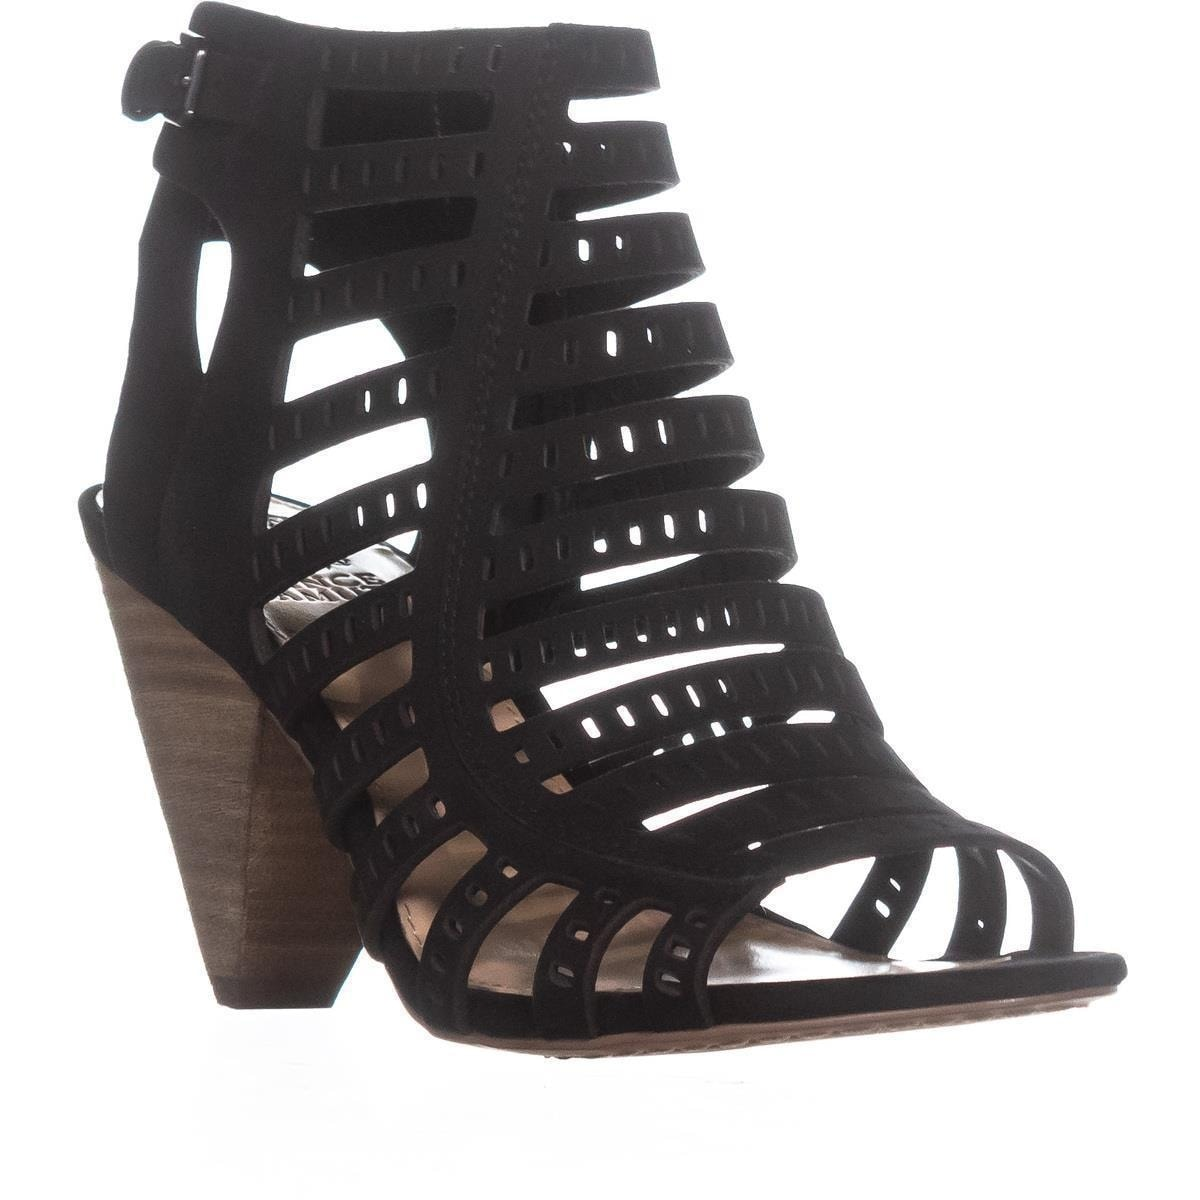 3baf1a096de5 Buy Vince Camuto Women s Sandals Online at Overstock